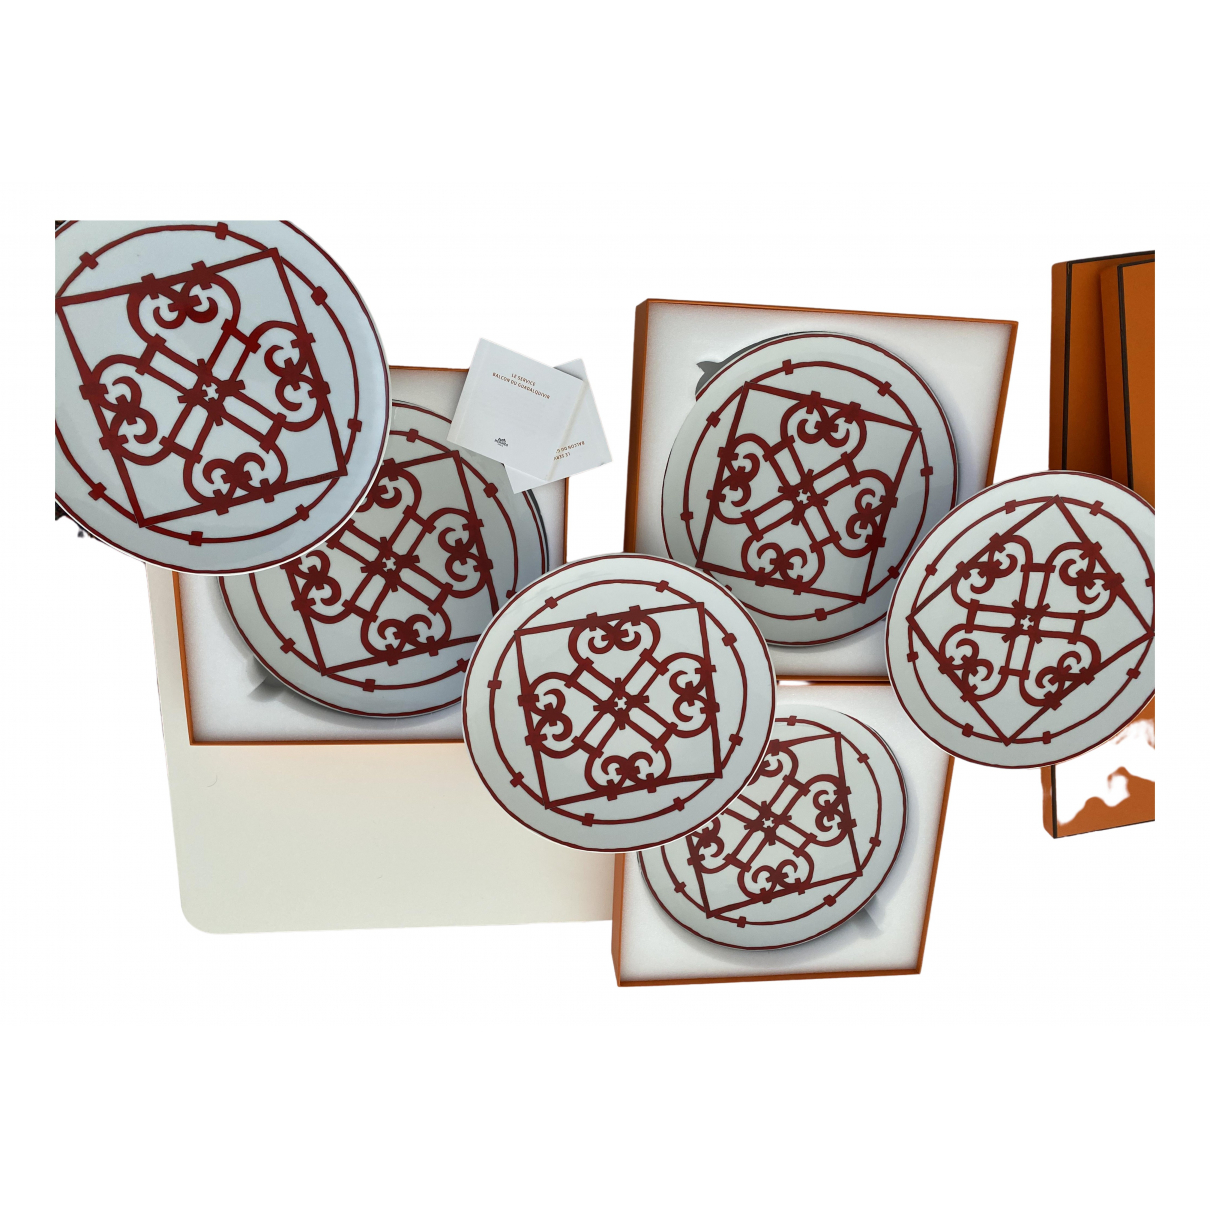 Hermès Balcon du Guadalquivir Red Porcelain Dinnerware for Life & Living \N